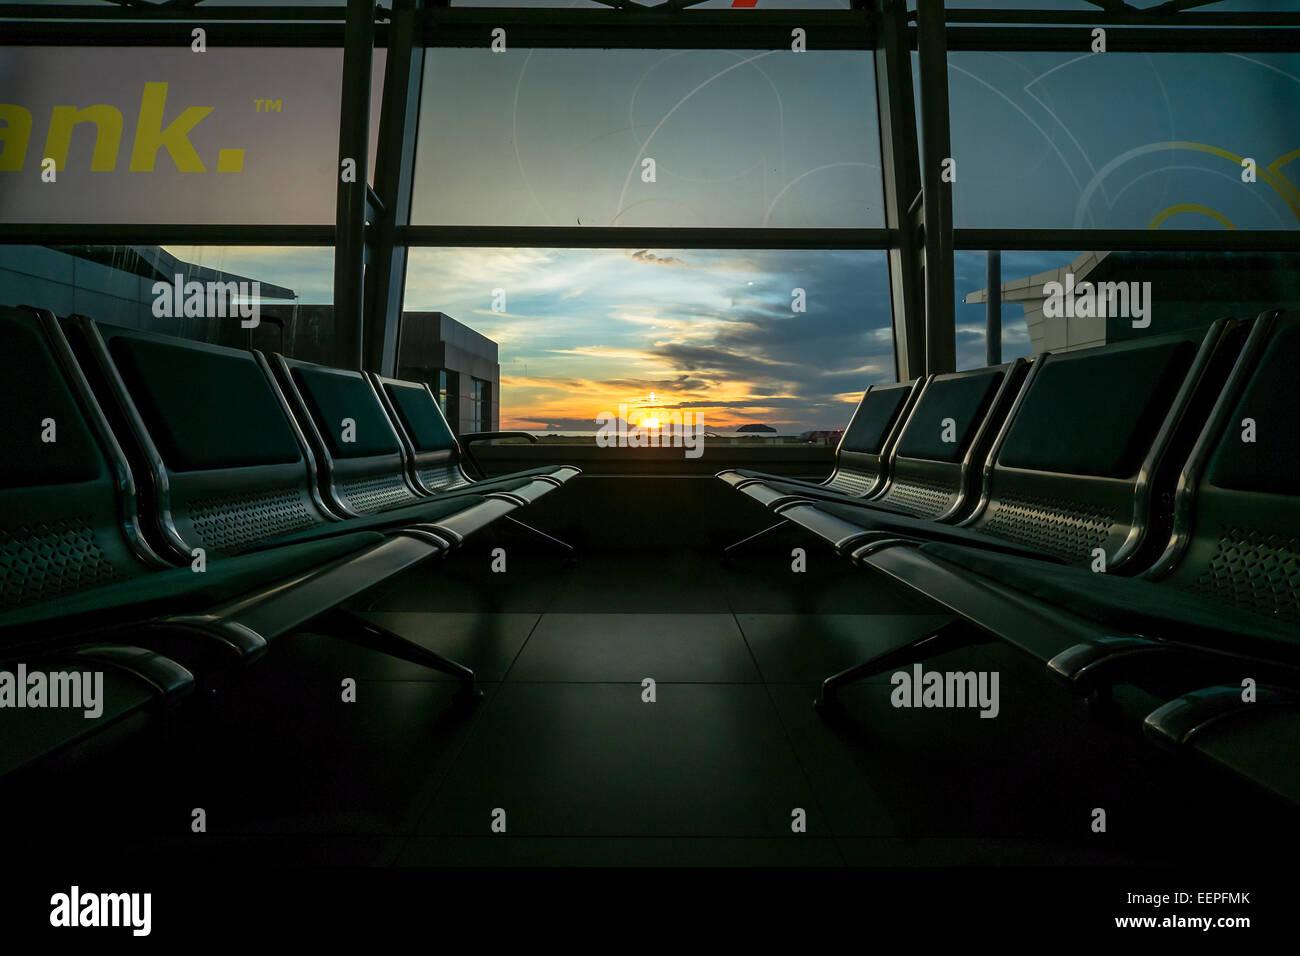 International Airport of Kota Kinabalu Malaysia during Sunset - Stock Image